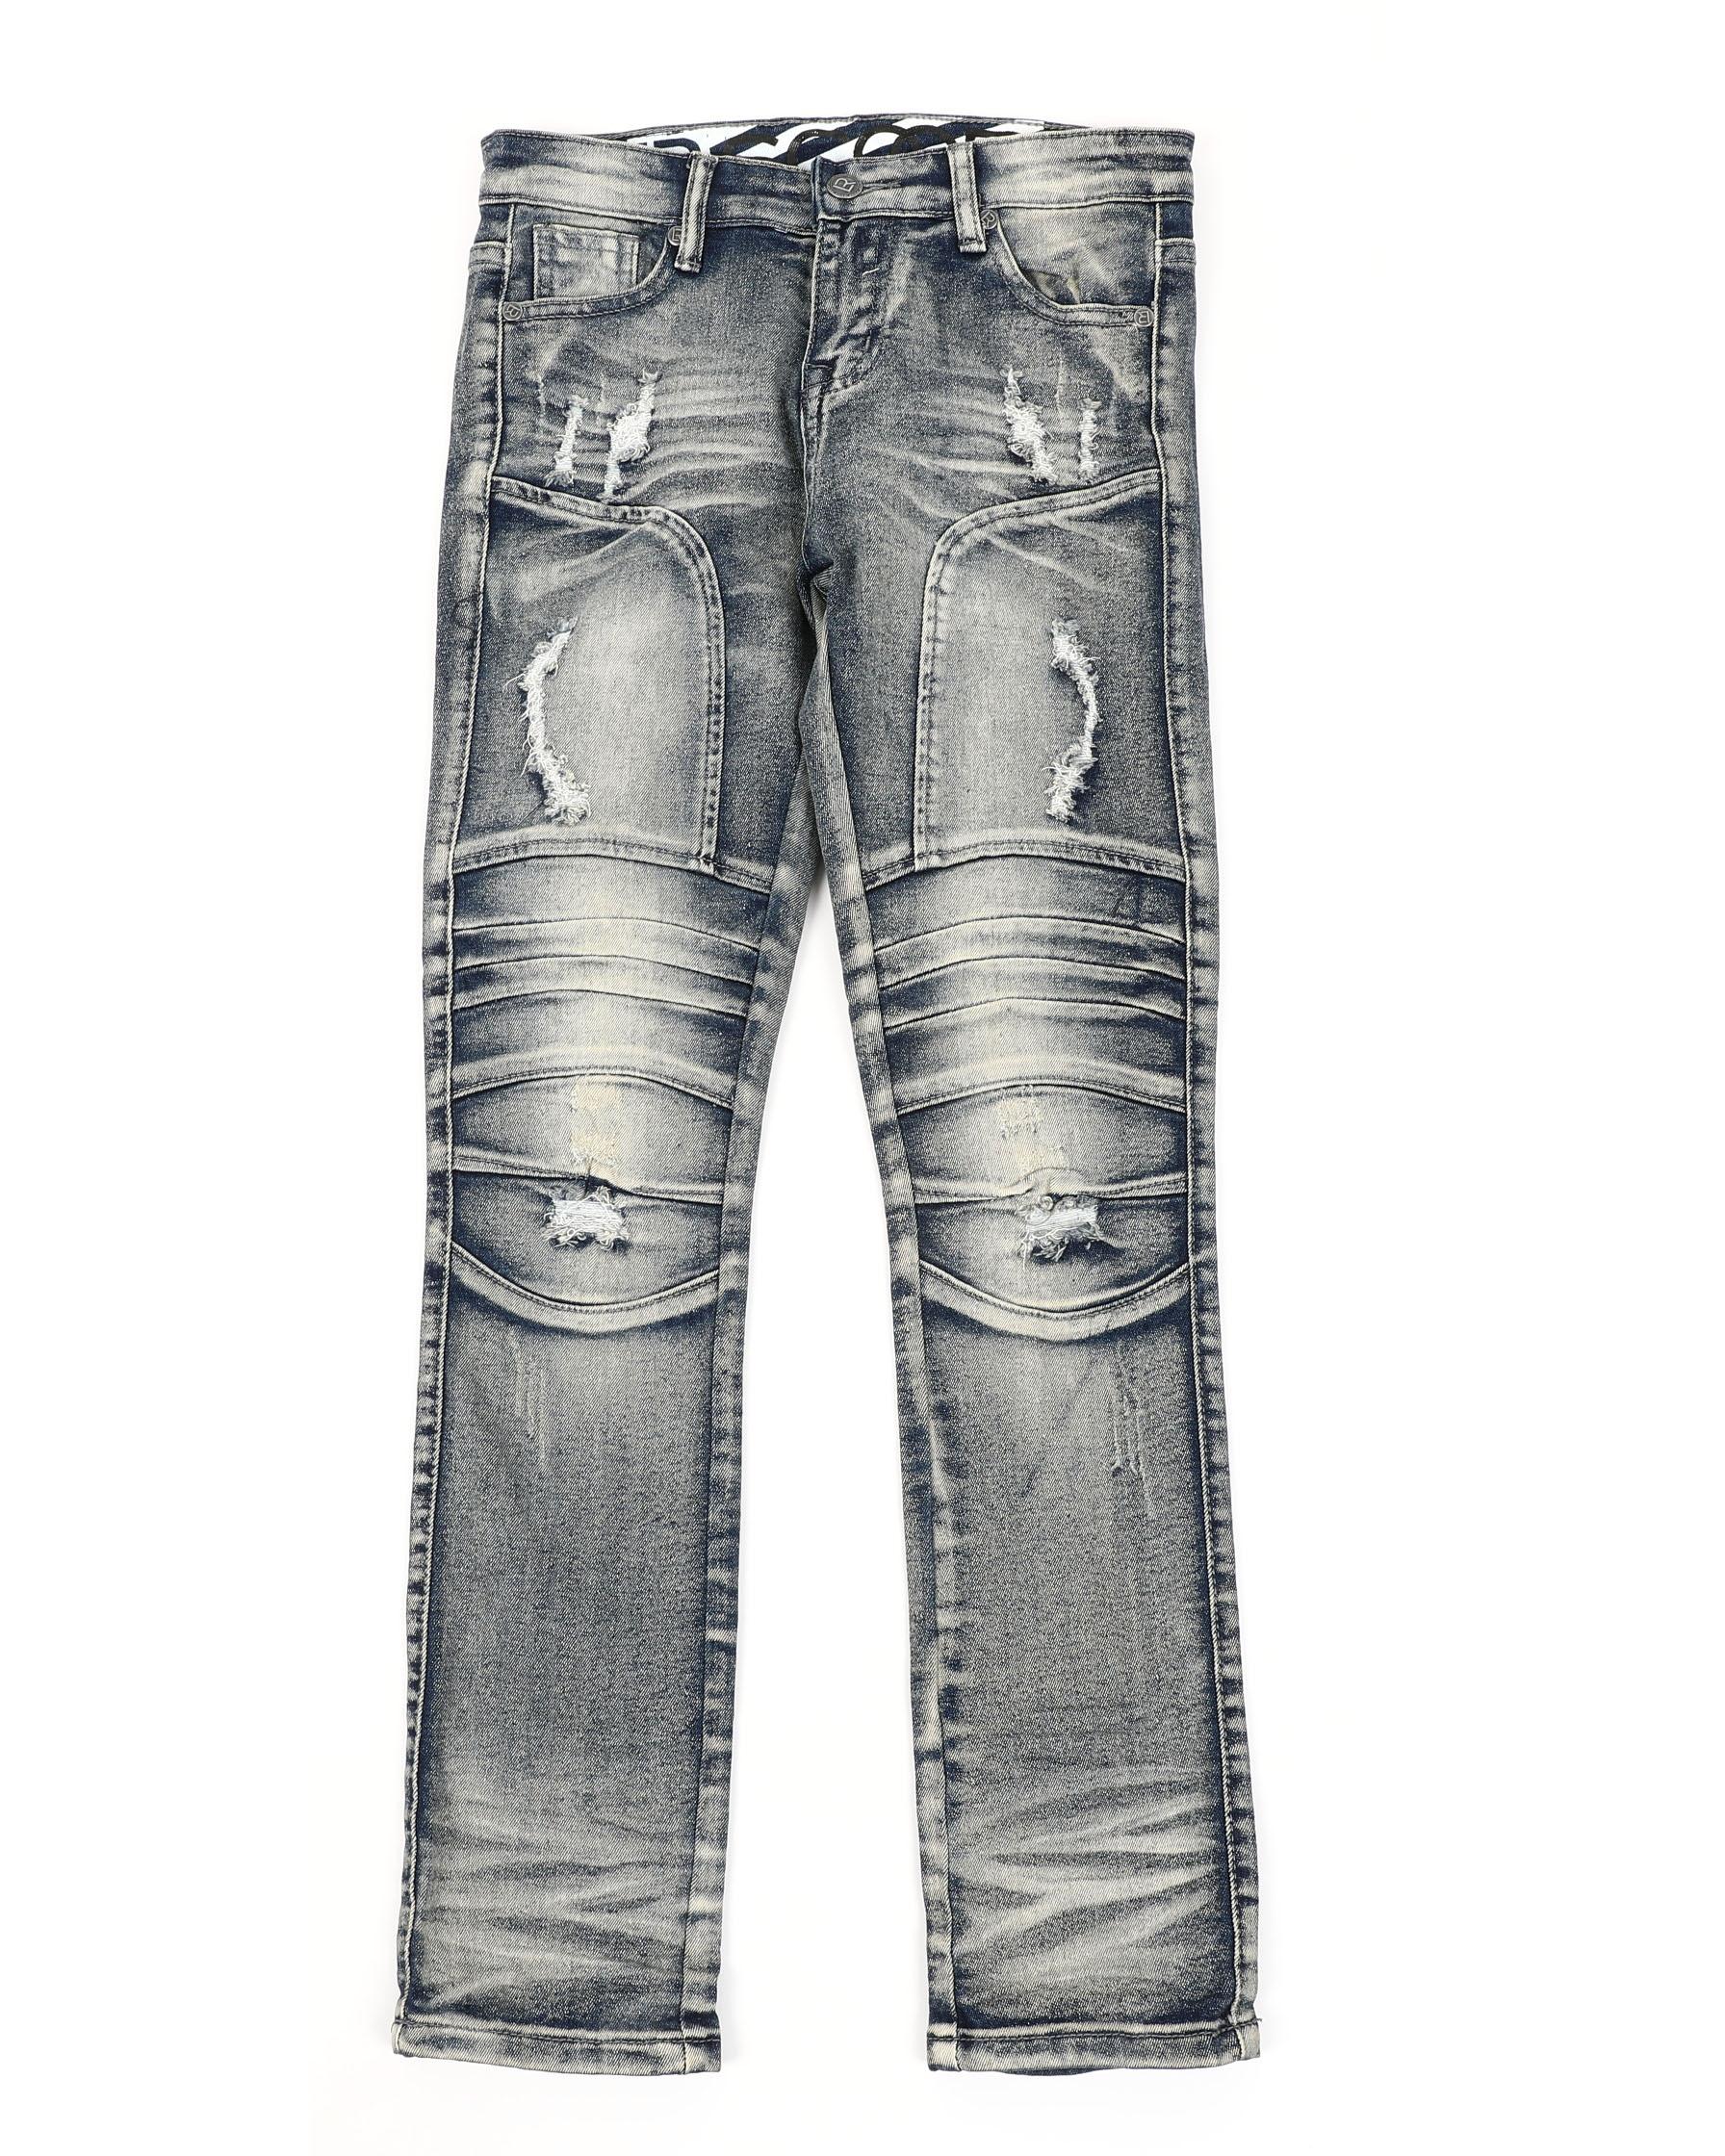 NWT Boy/'s LR Scoop Washed Black Stretch Denim Classic Skinny Jeans ALL SIZES